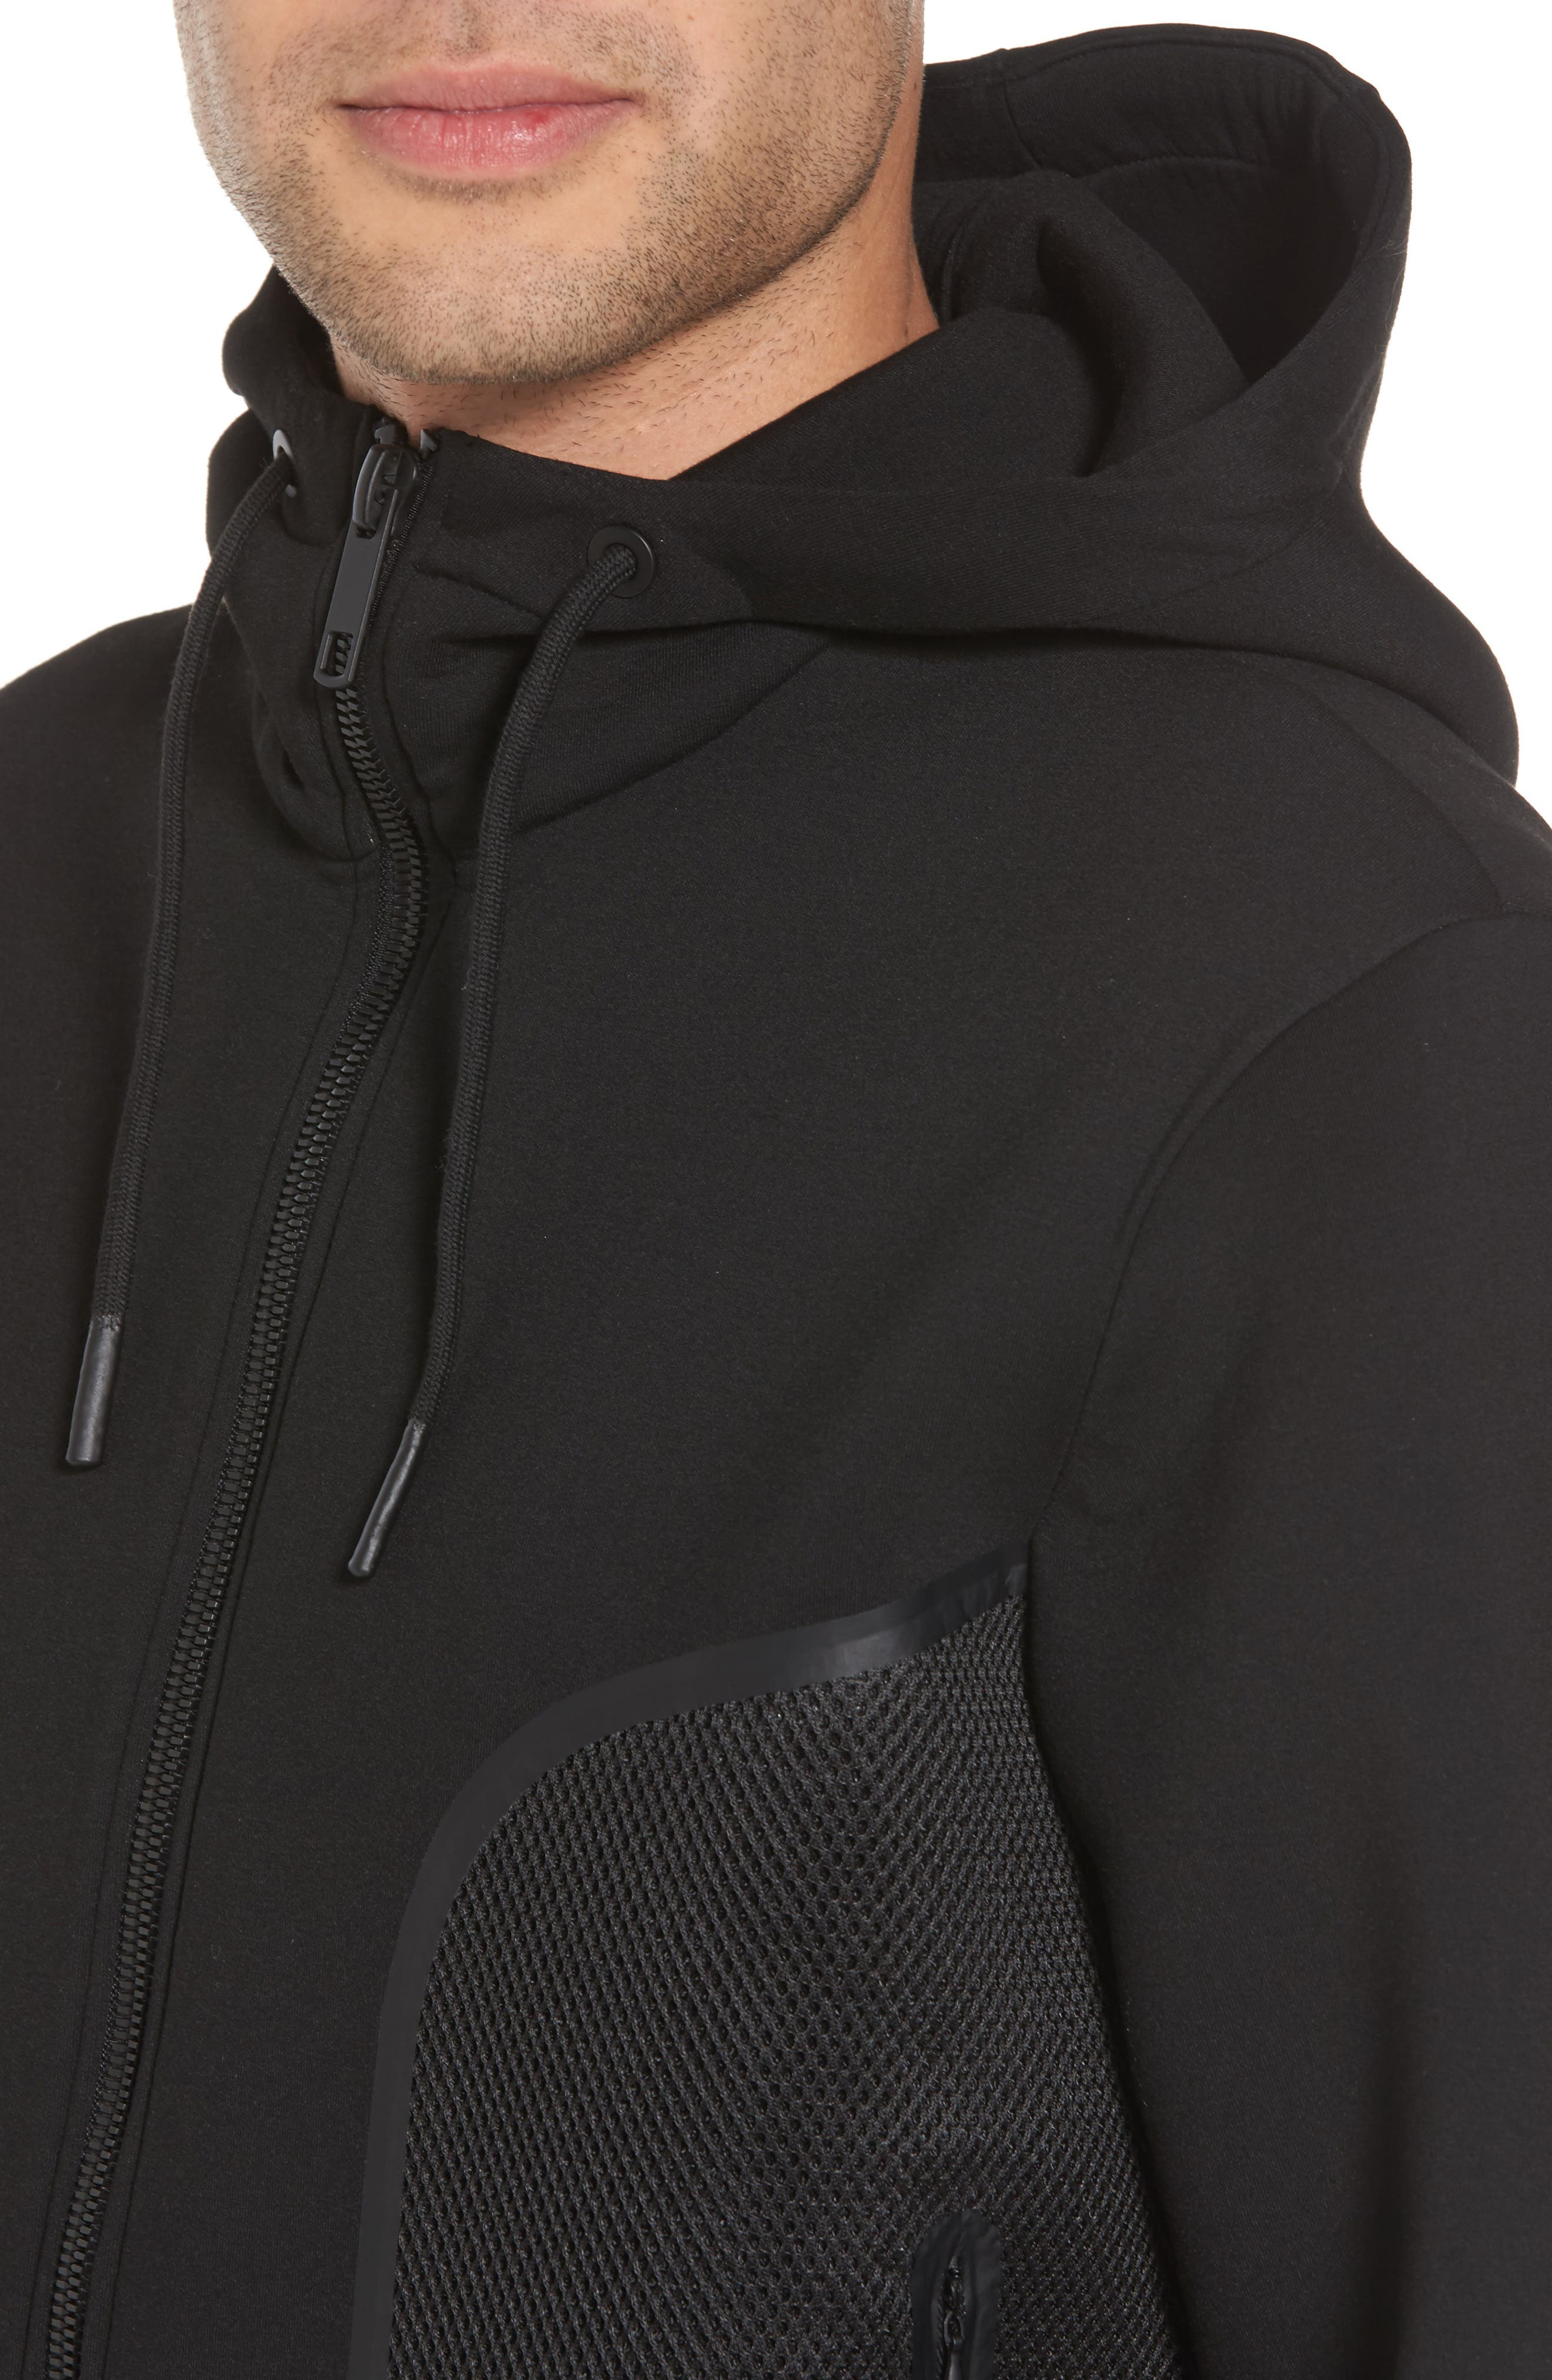 Hooded Fleece Jacket,                             Alternate thumbnail 4, color,                             Black